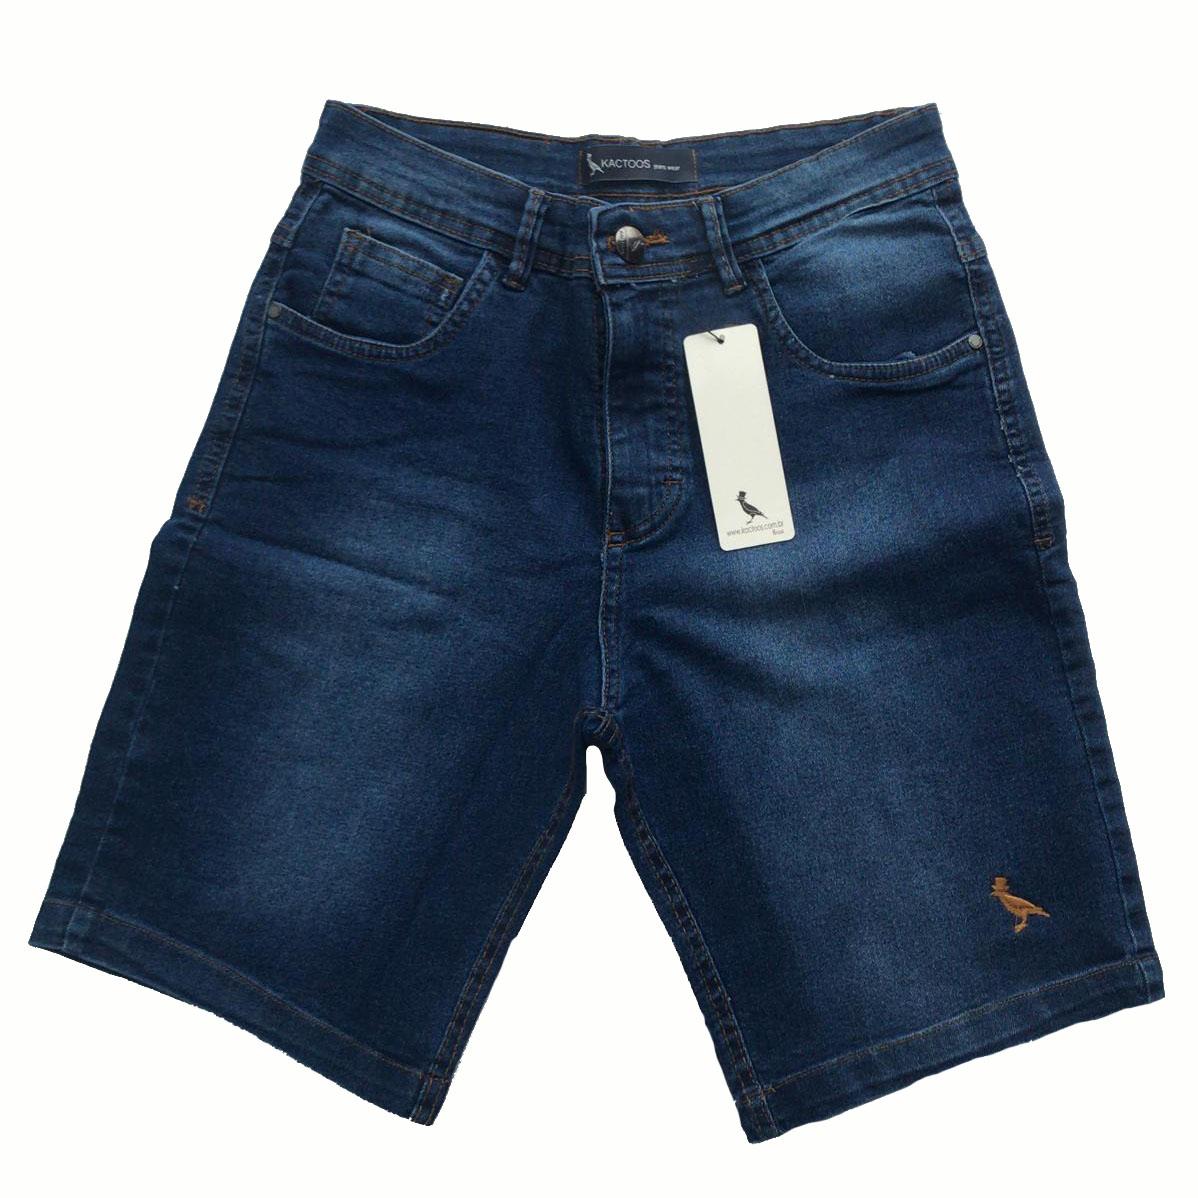 Bermuda Jeans Masculina  - Kactoos